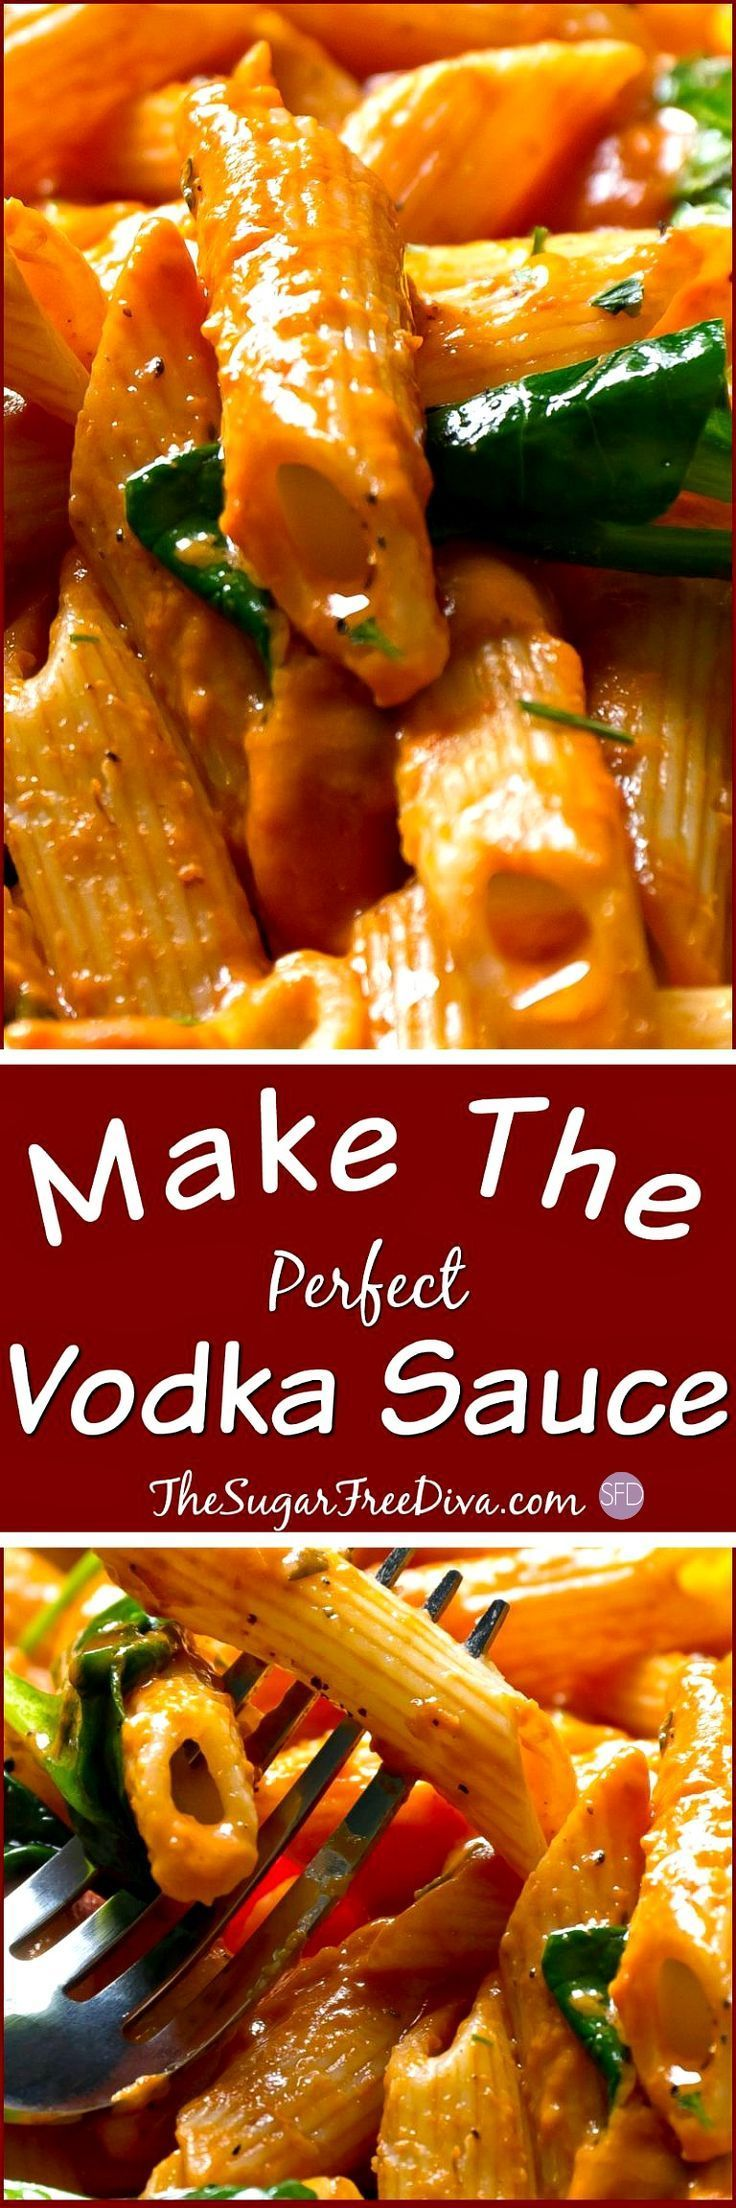 This is the best pasta sauce ever! It had VODKA in it! #pasta #vodka #recipe #pasta #dinner #best #food #pastafoodrecipes